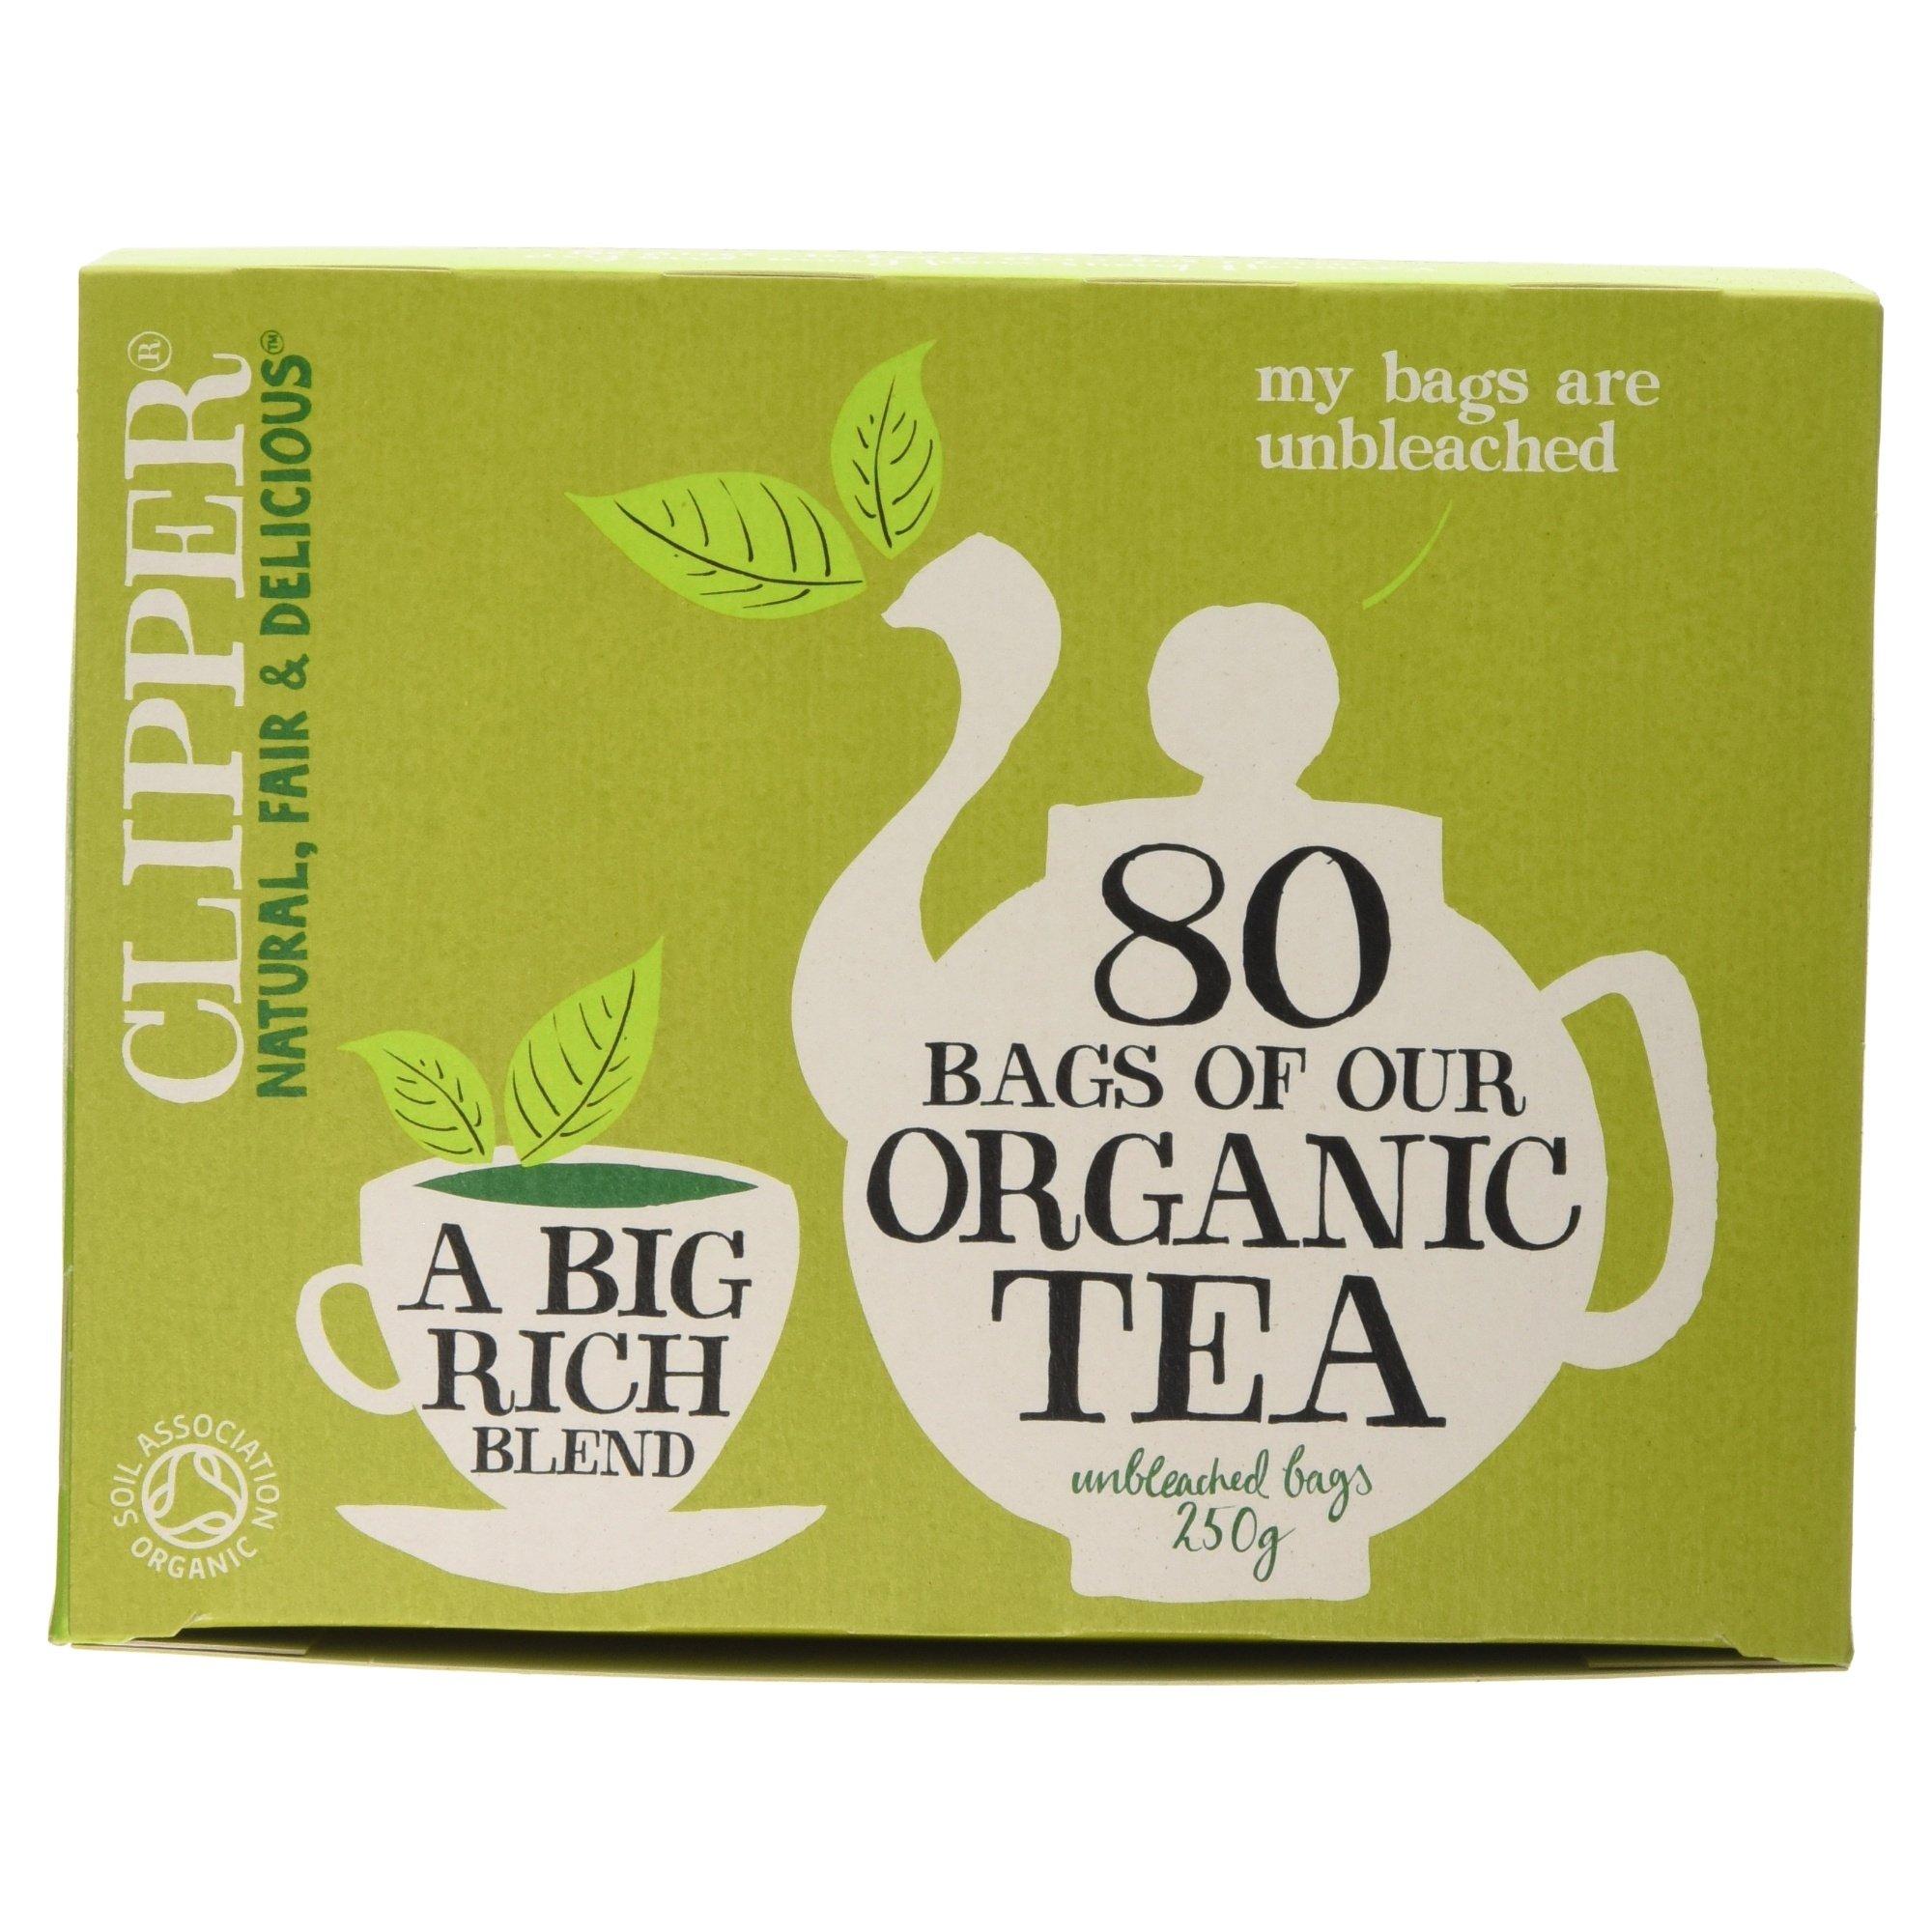 Clipper organic everyday decaf tea (soil association) (black tea) (everyday) (80 bags) (brews in 2-3 minutes)